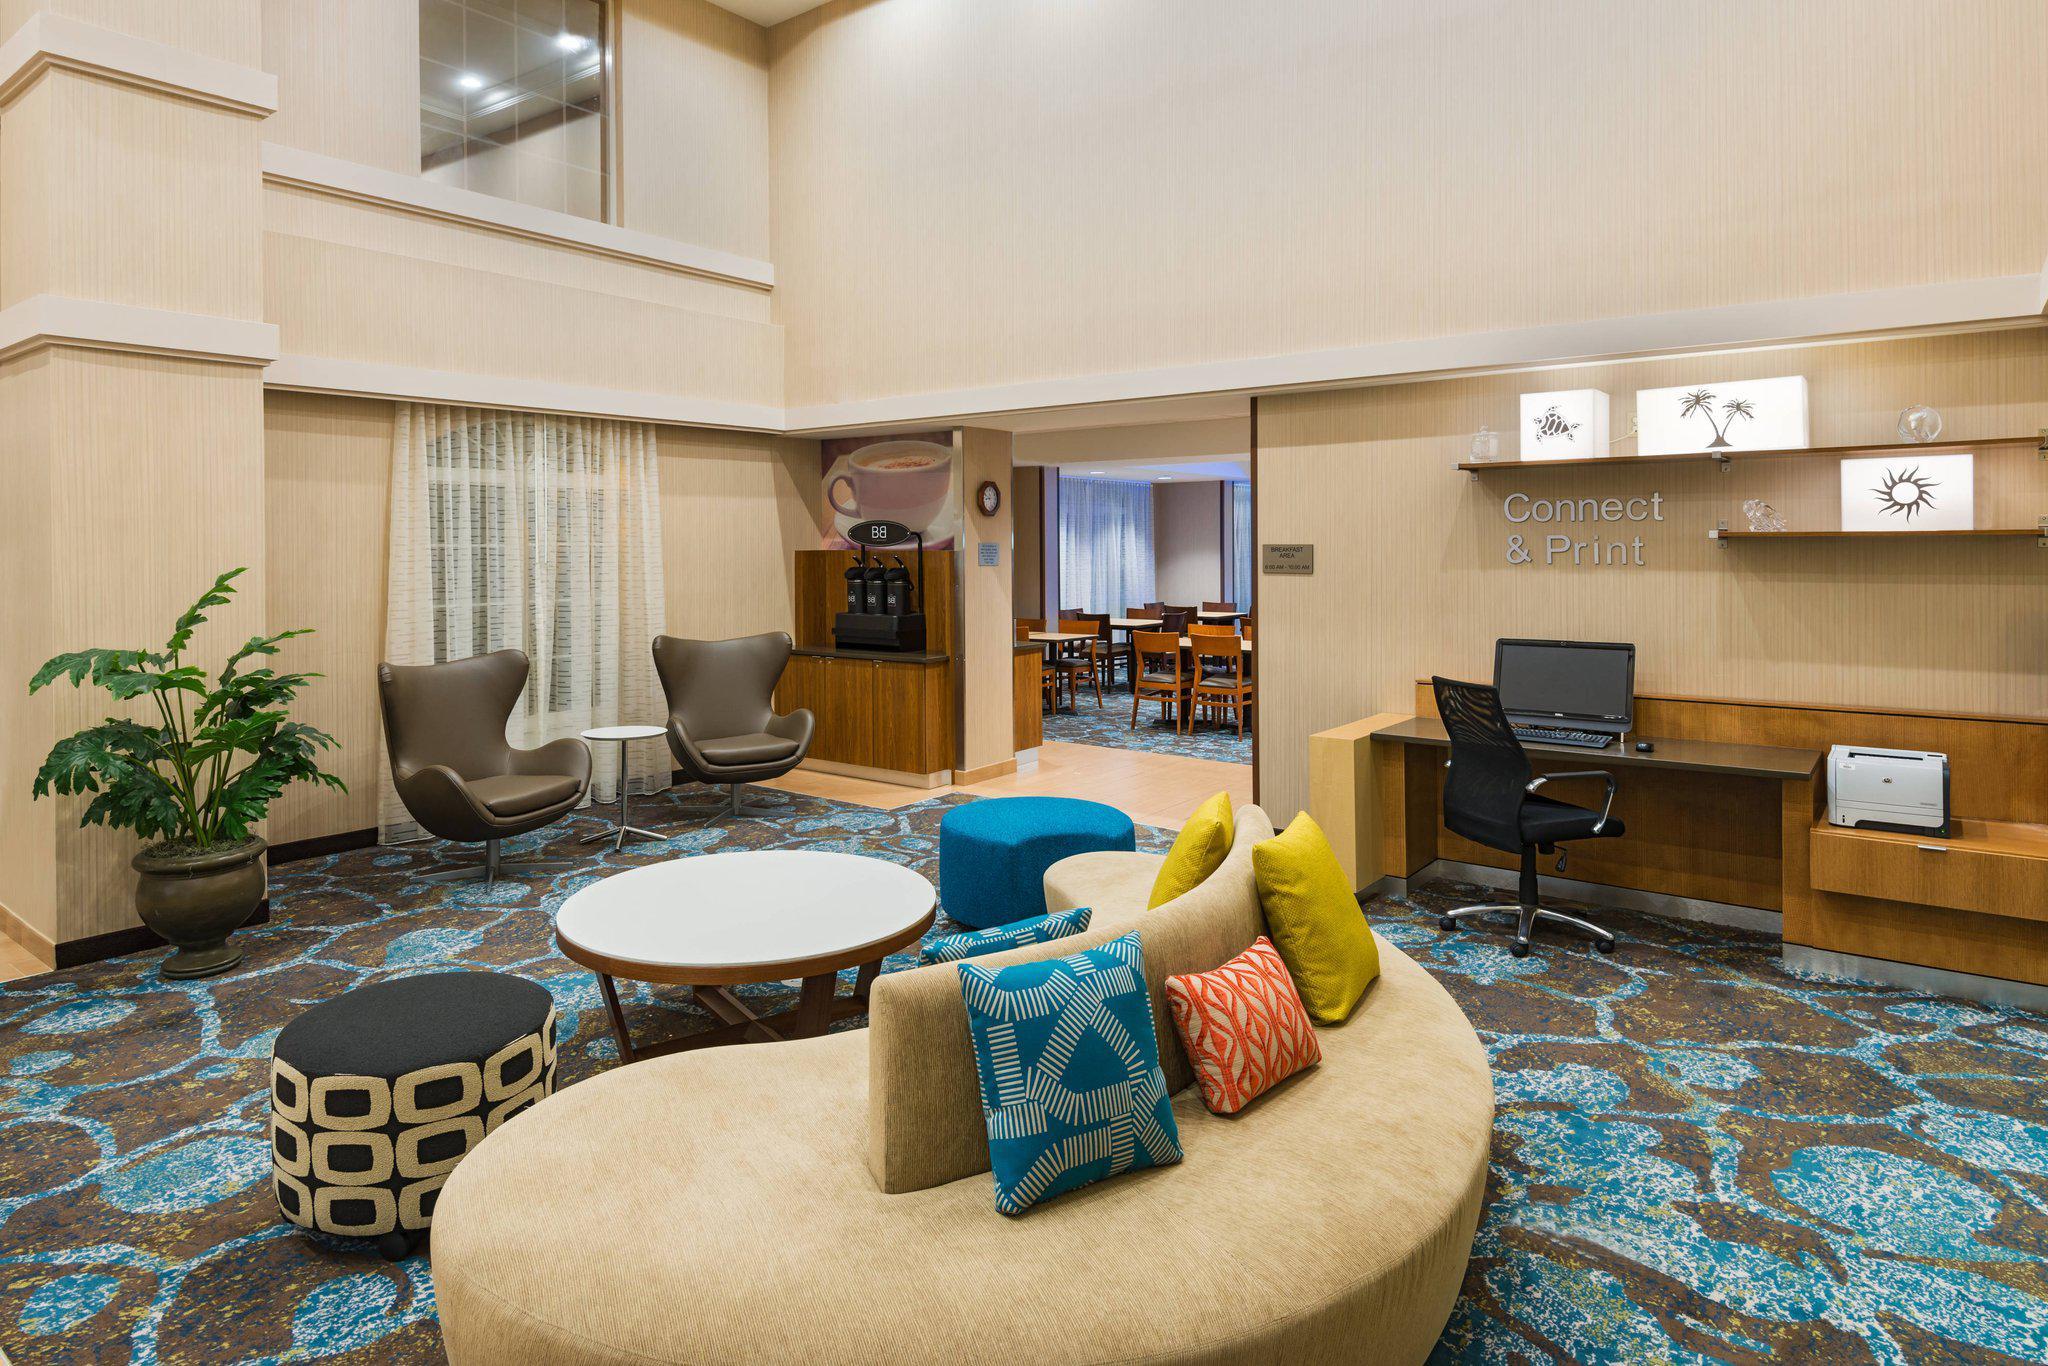 Fairfield Inn & Suites by Marriott Clearwater in Clearwater, FL, photo #2